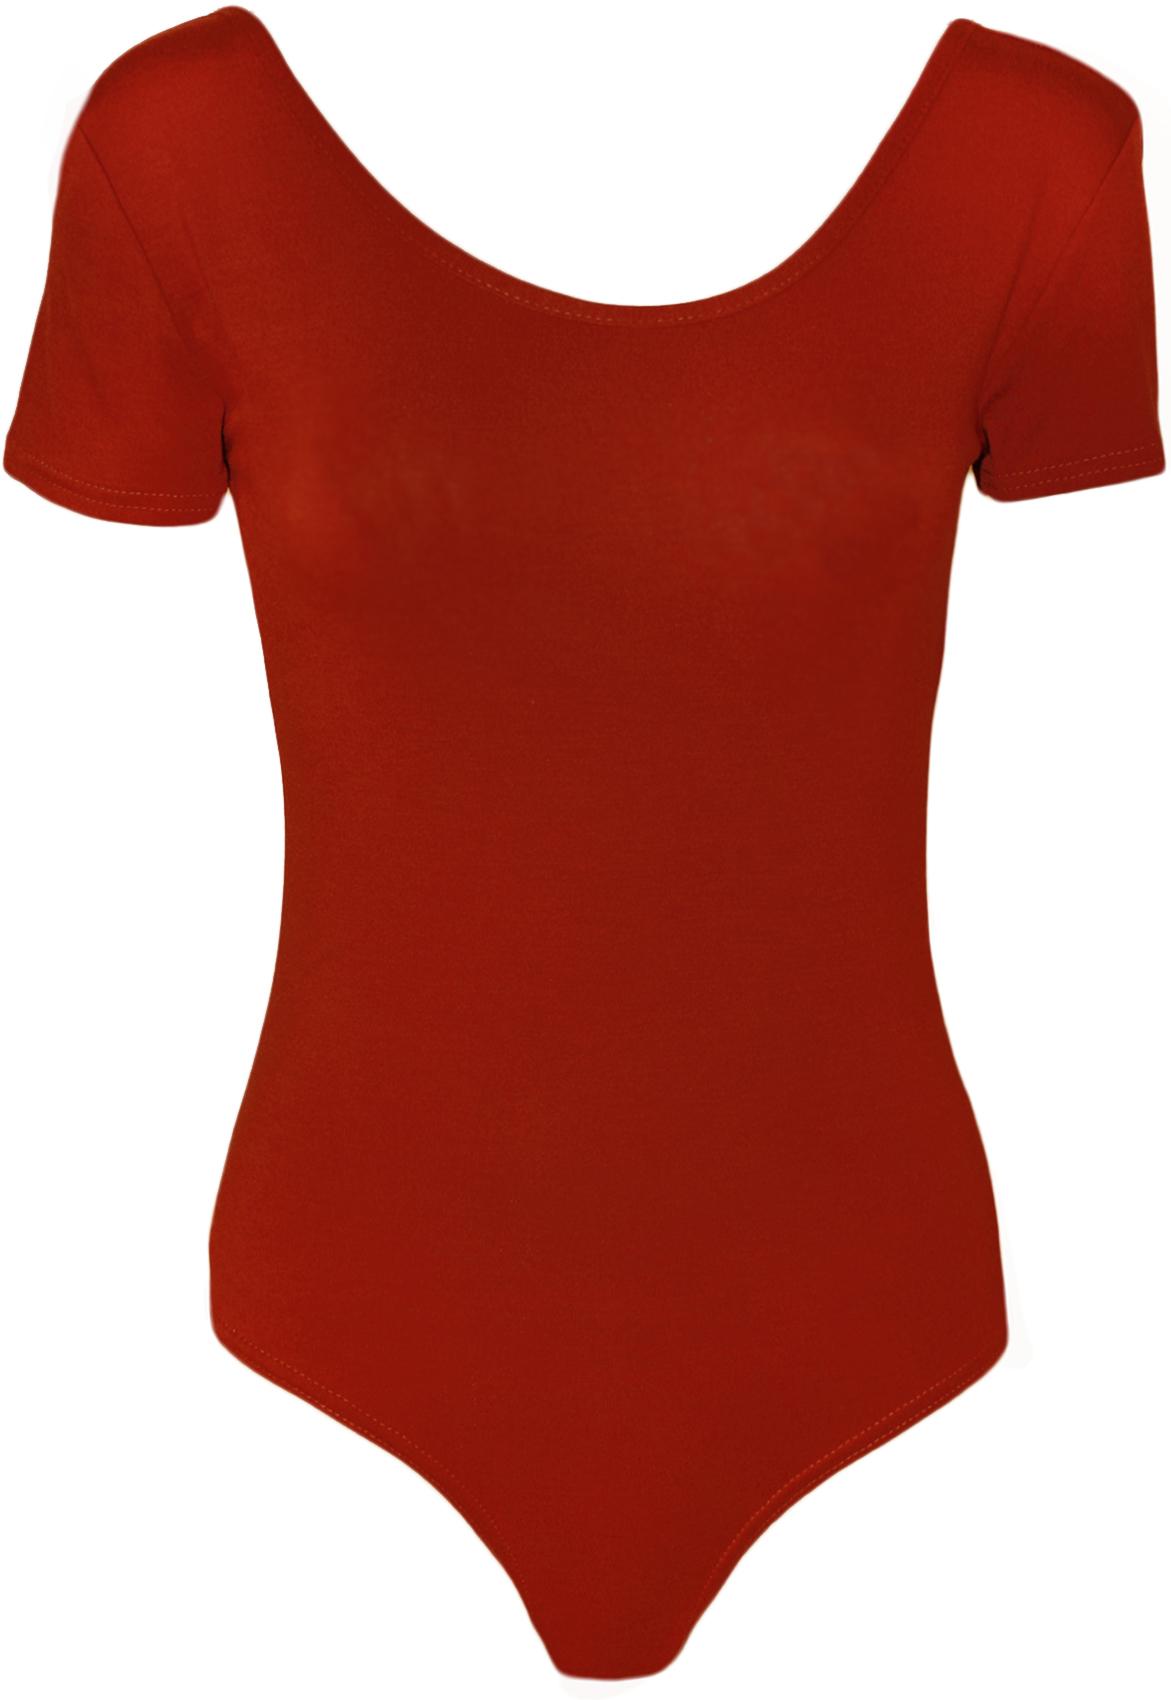 New-Womens-Short-Sleeve-Scoop-Neck-Ladies-Stretch-Bodysuit-Leotard-Top-8-14